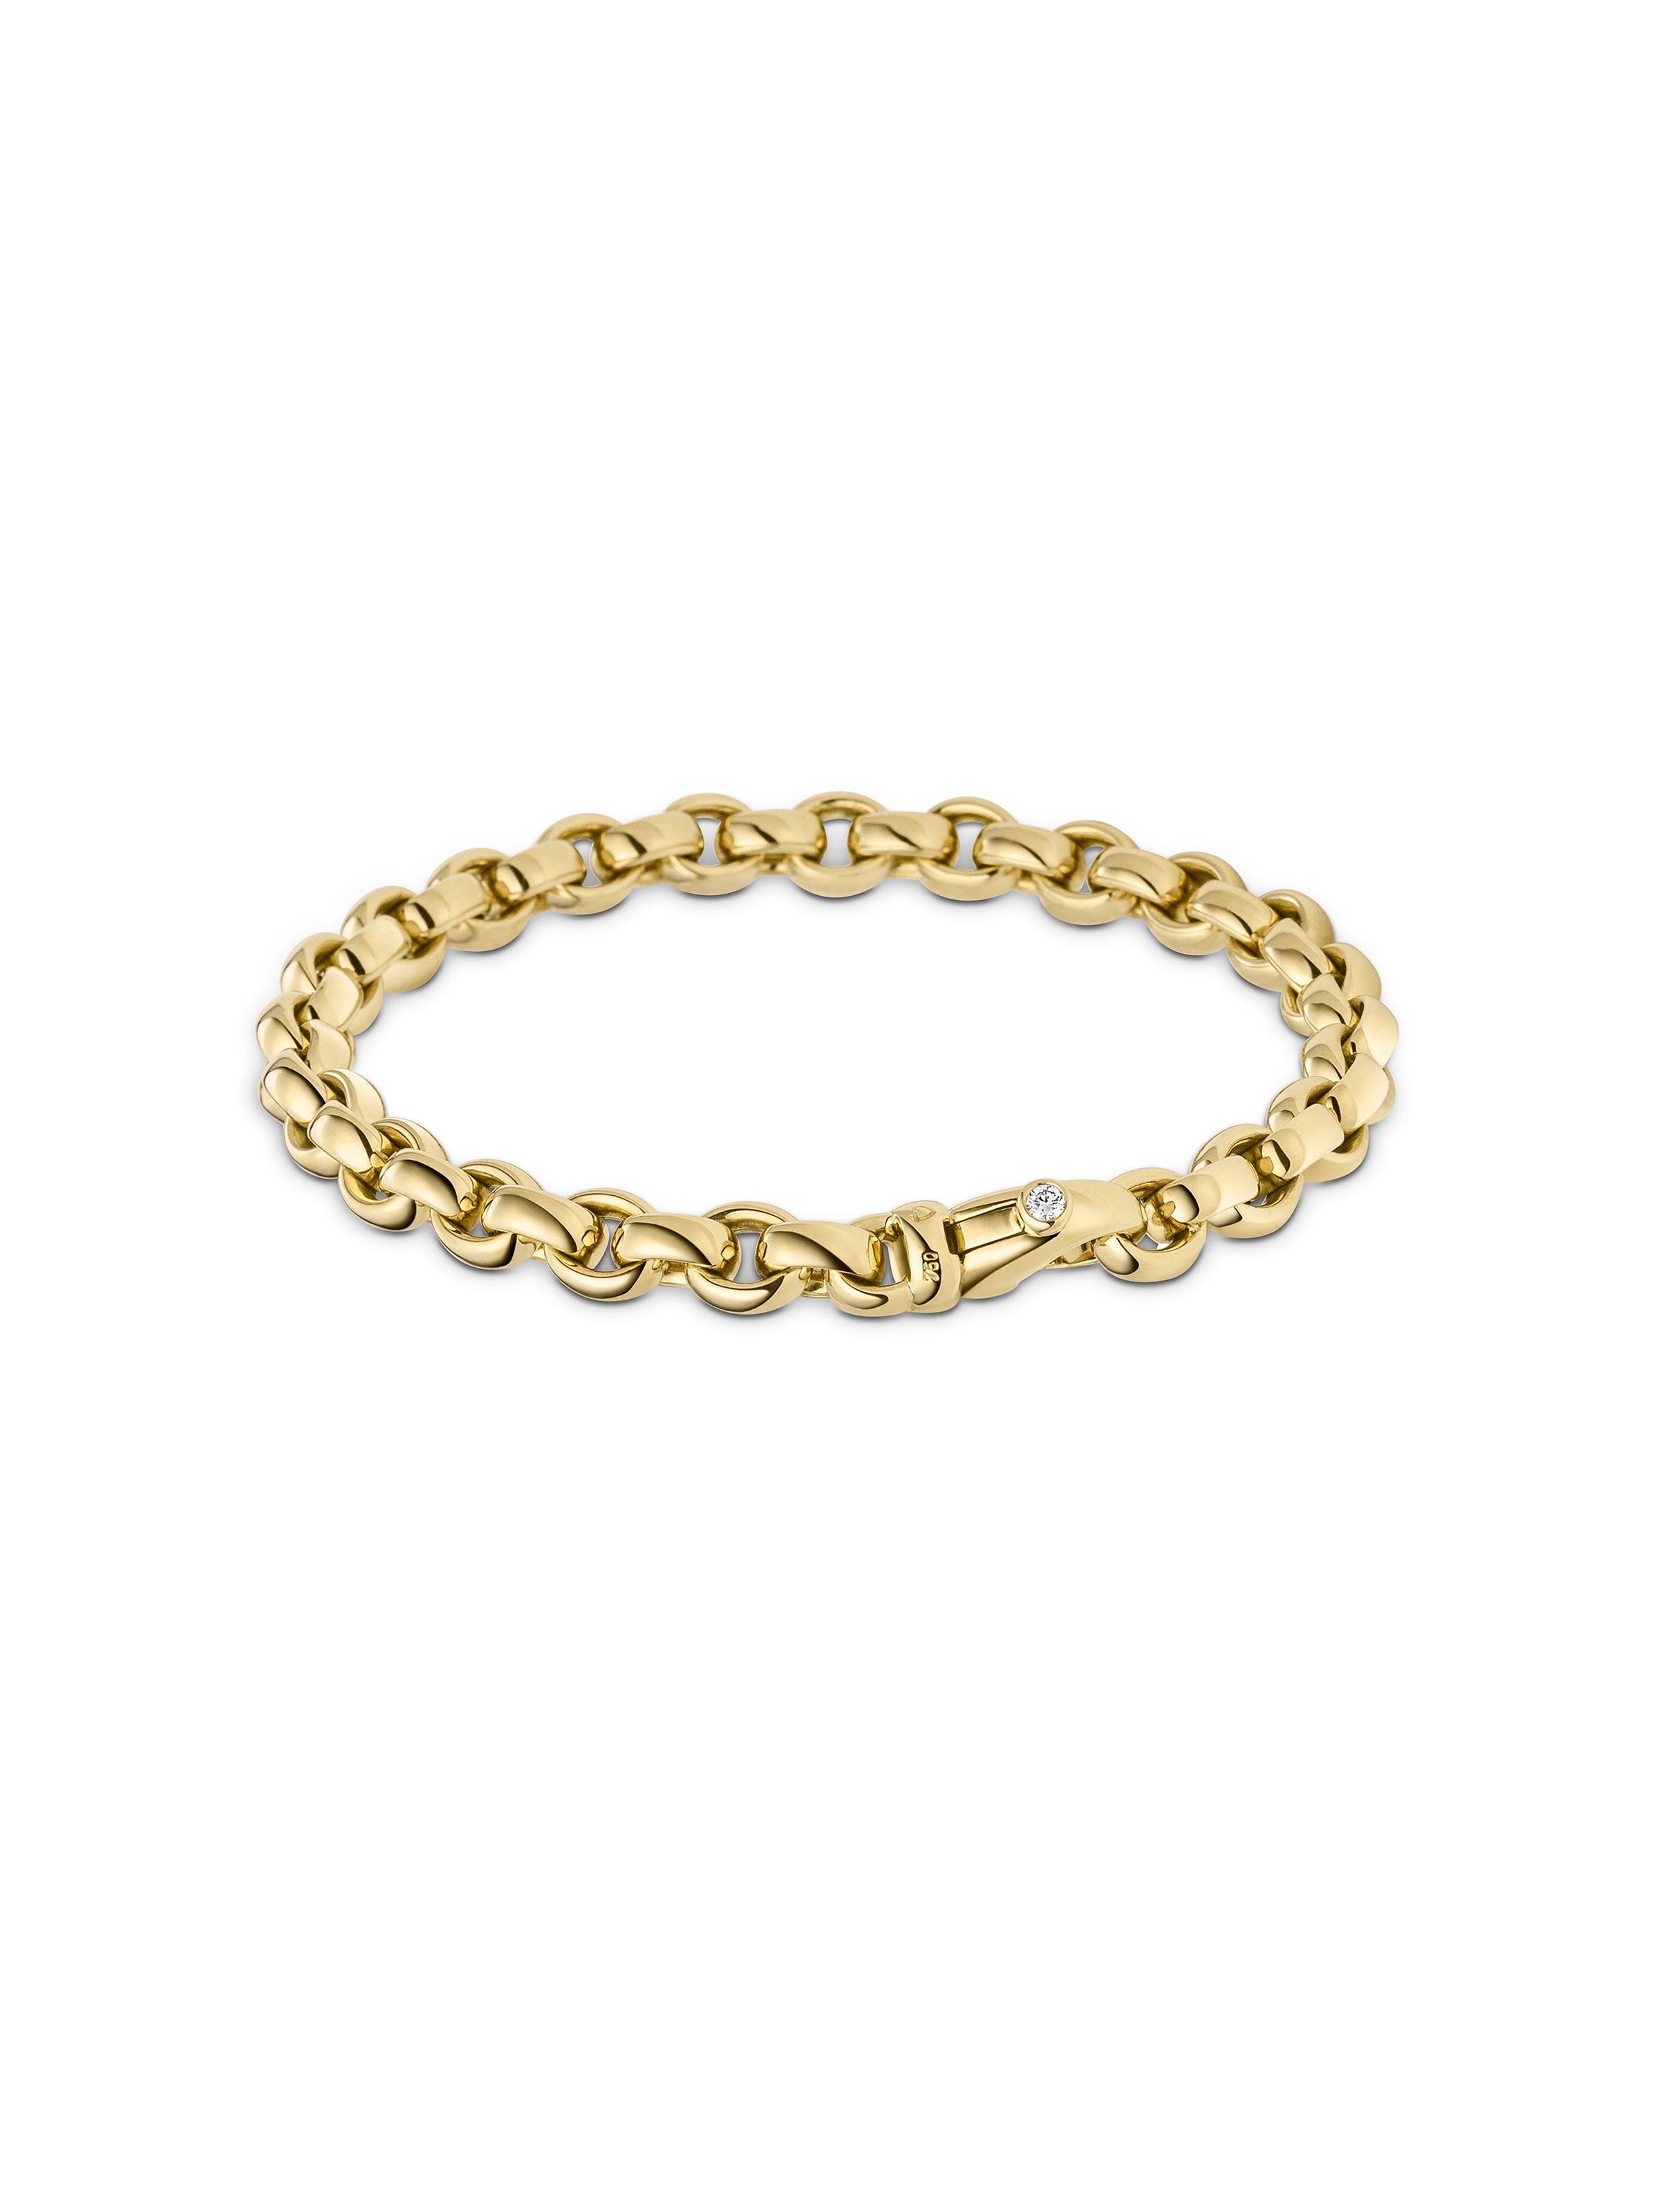 ChaCha 6mm bracelet